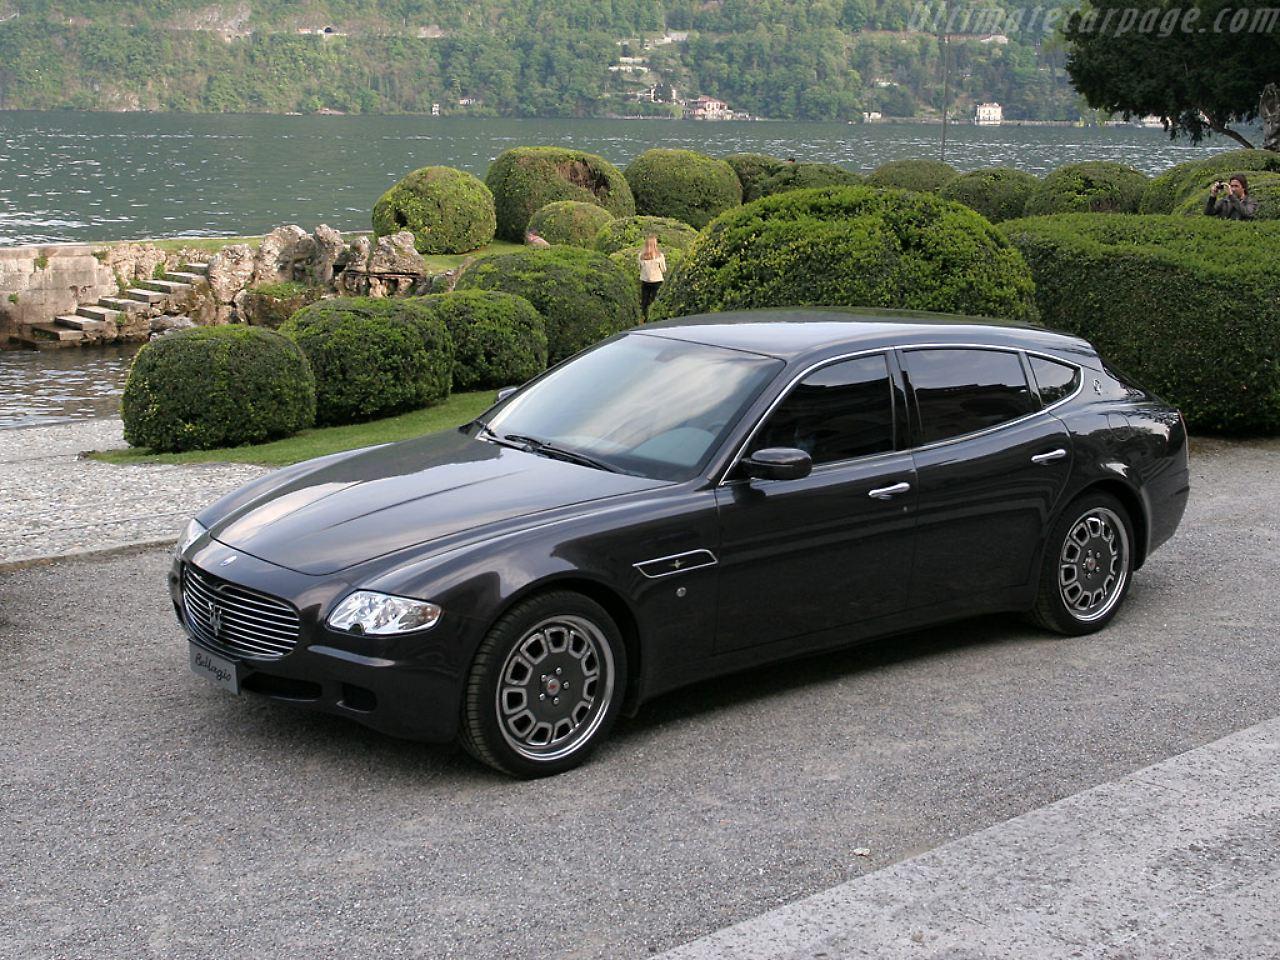 Maserati Bellagio Touring